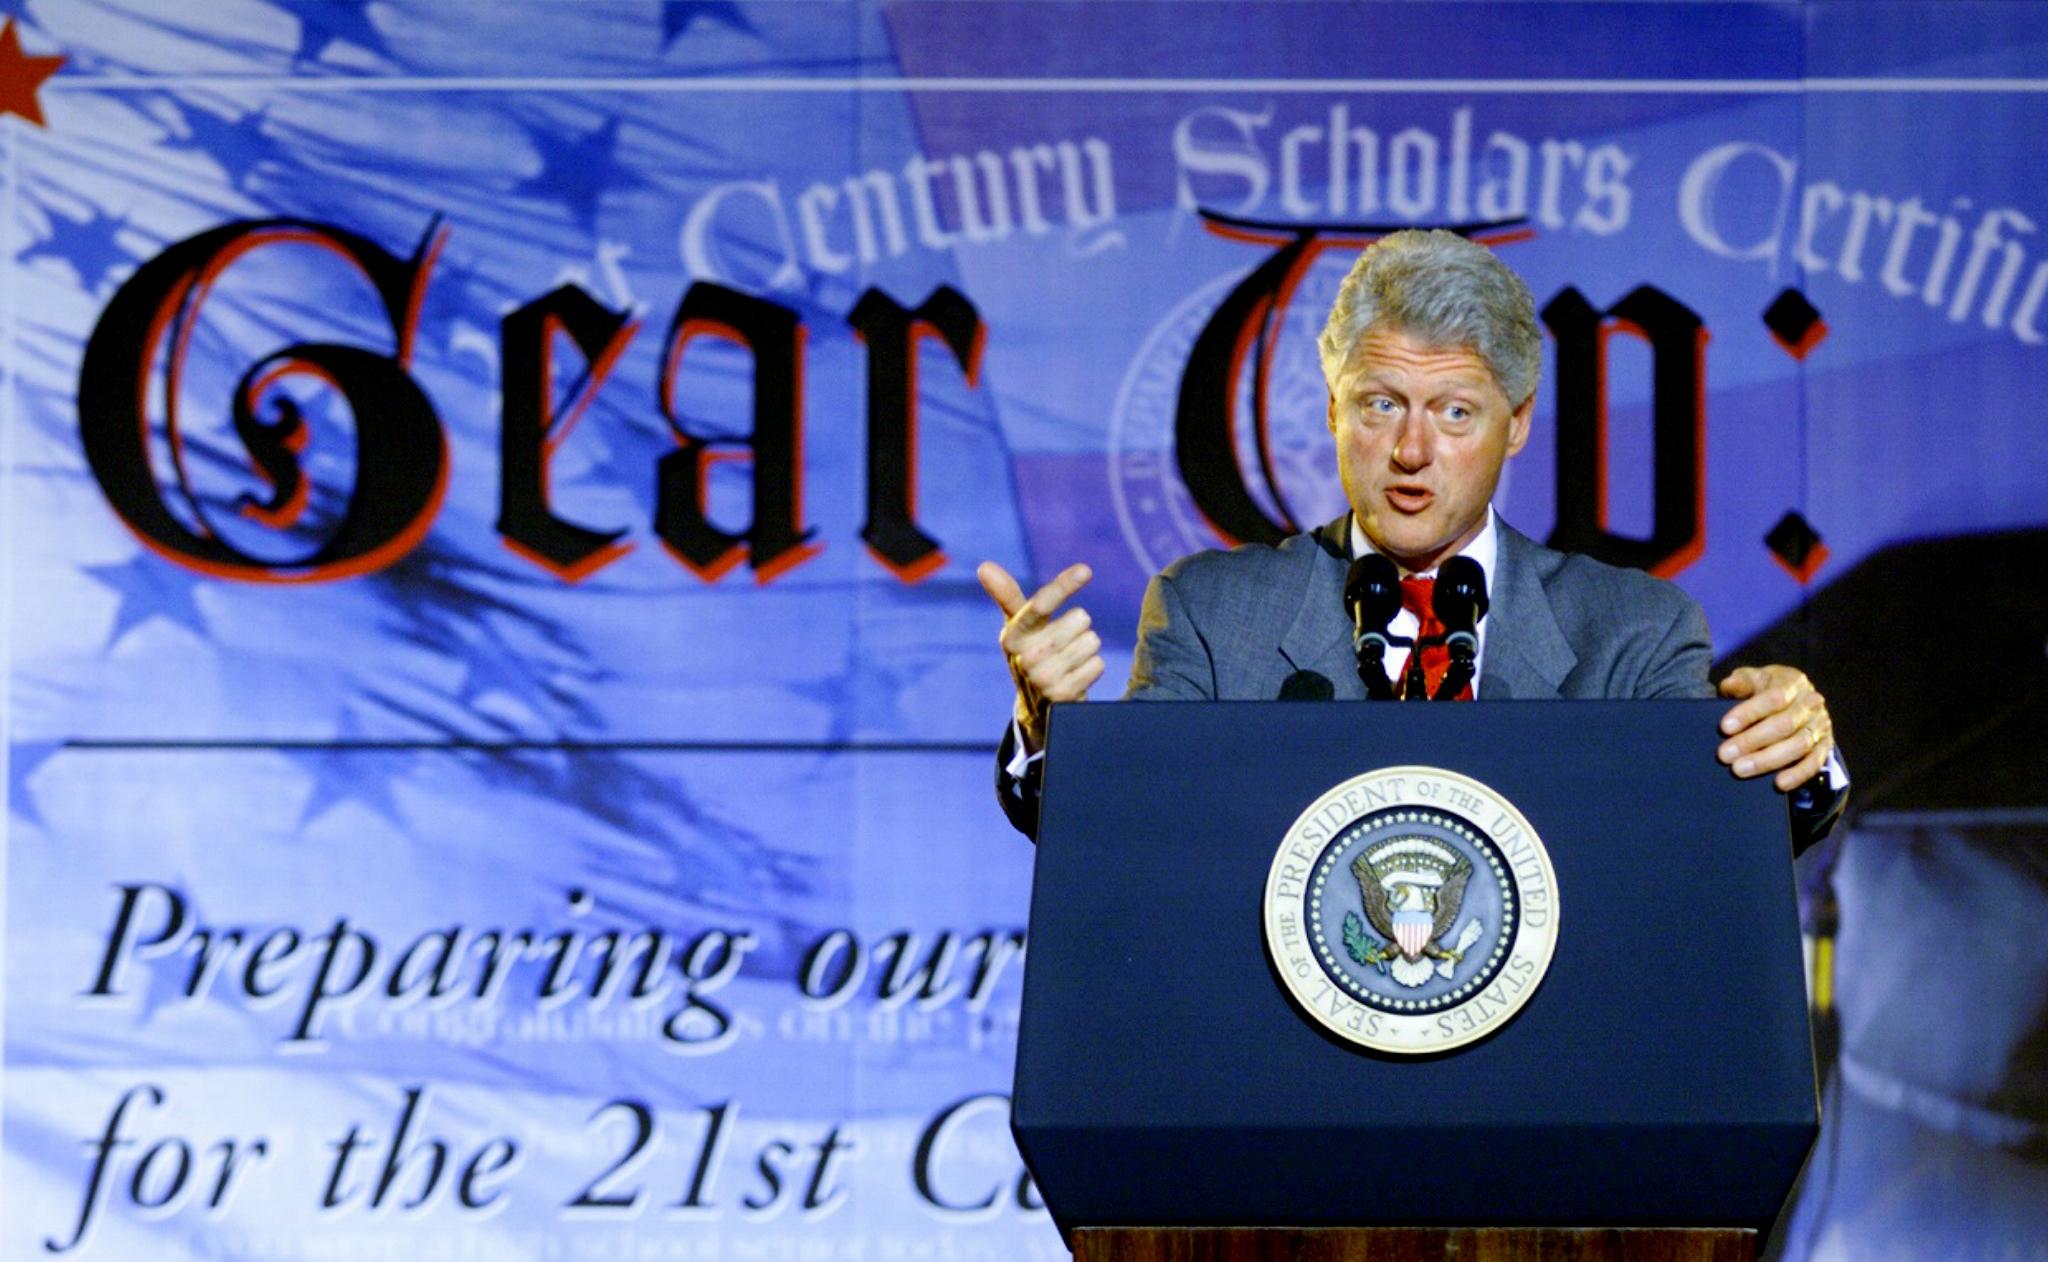 President Bill Clinton promotes the Gear Up Program